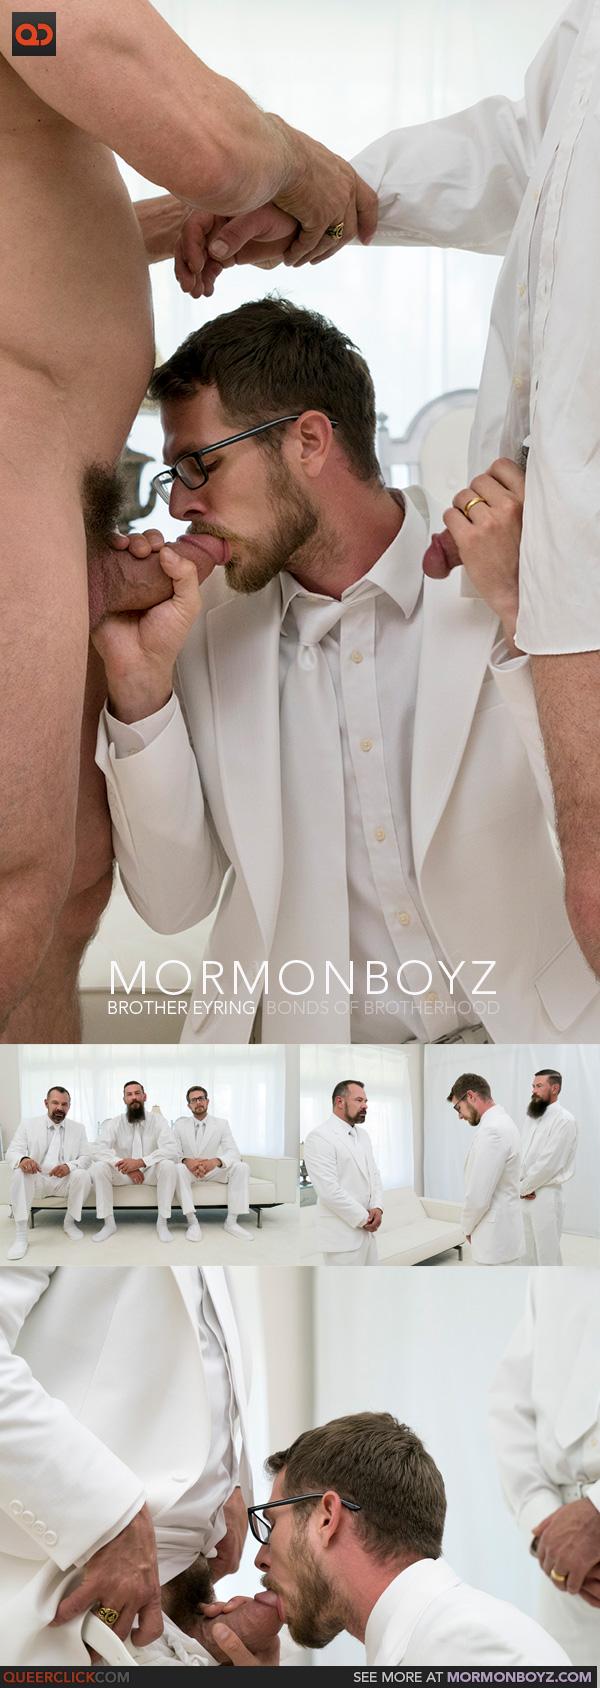 MormonBoyz: Brother Eyring